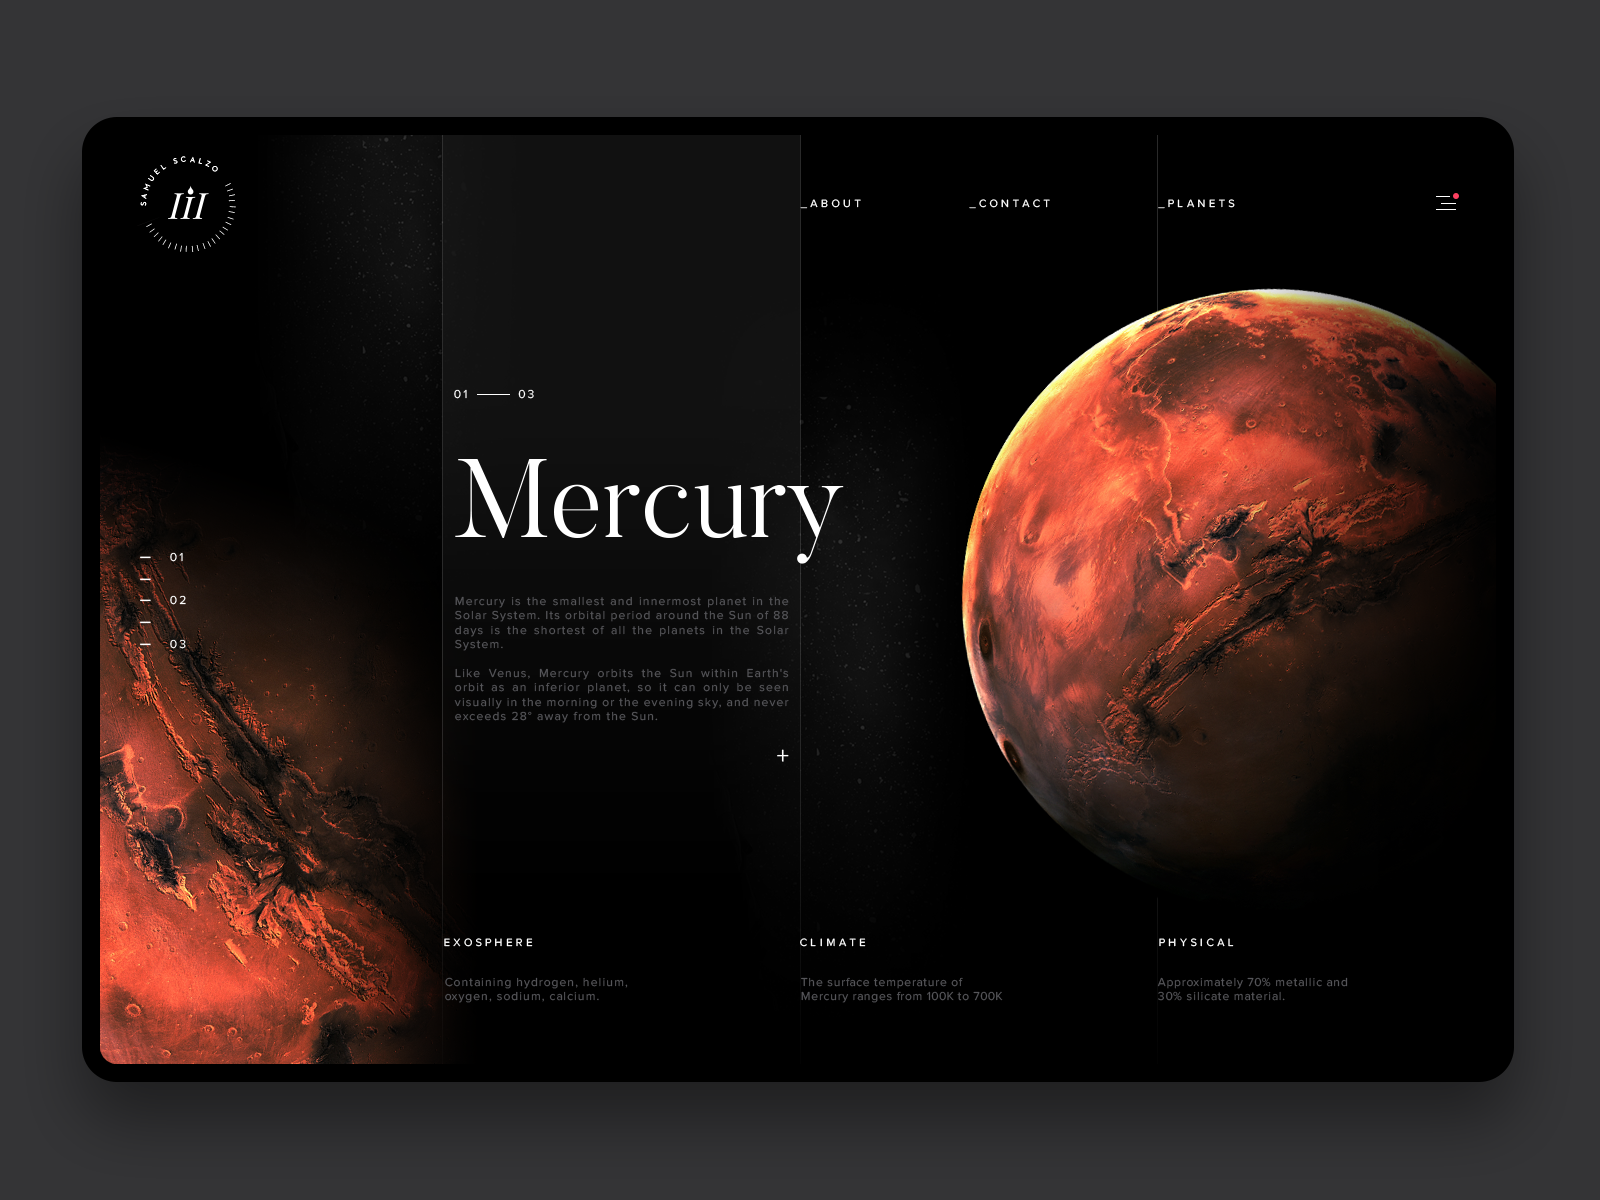 Space exploration mercury hd